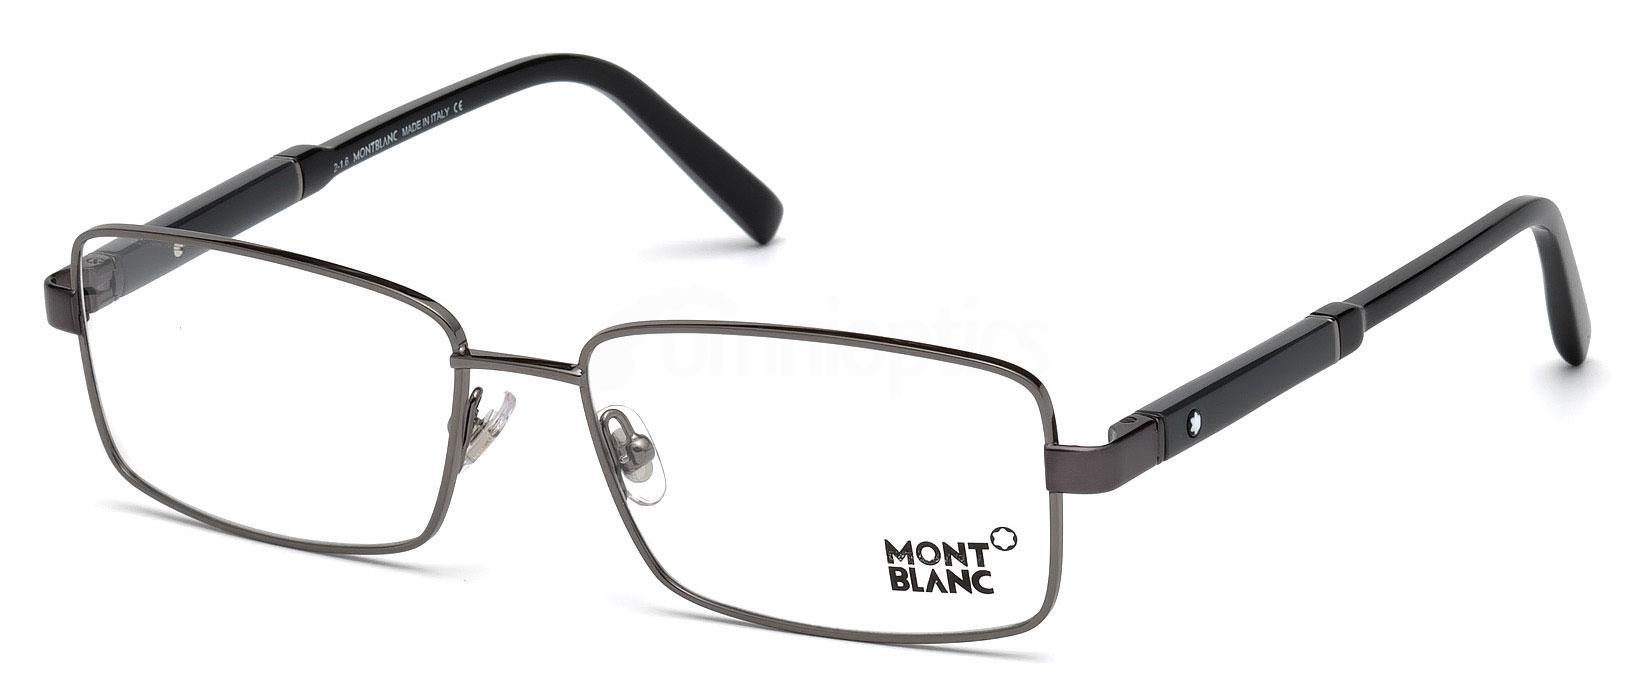 008 MB0640 Glasses, Mont Blanc